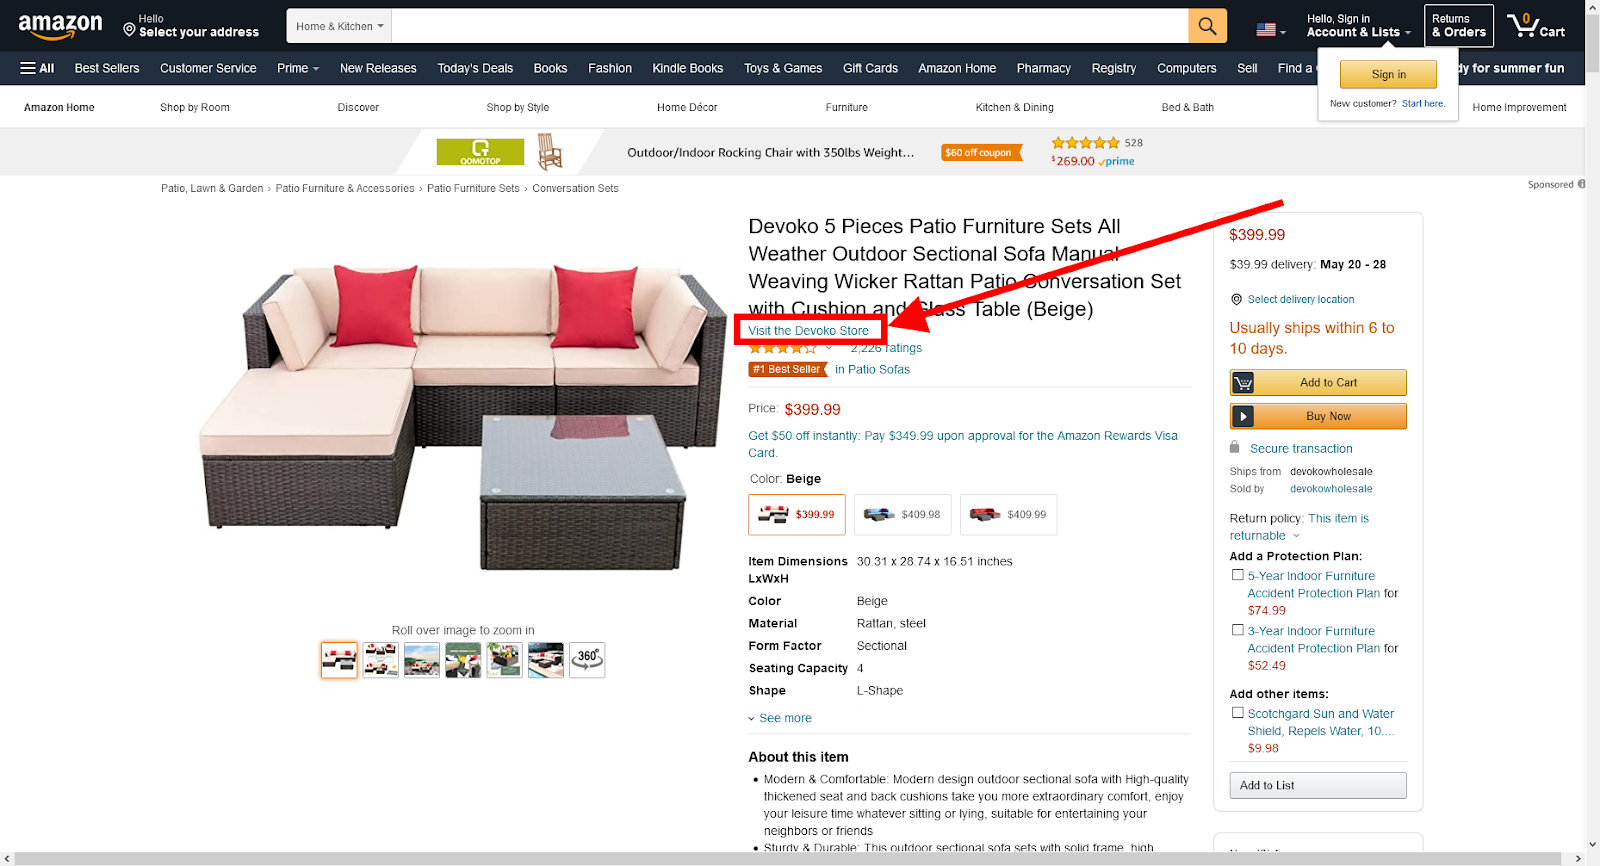 hyperlinked store name Amazon